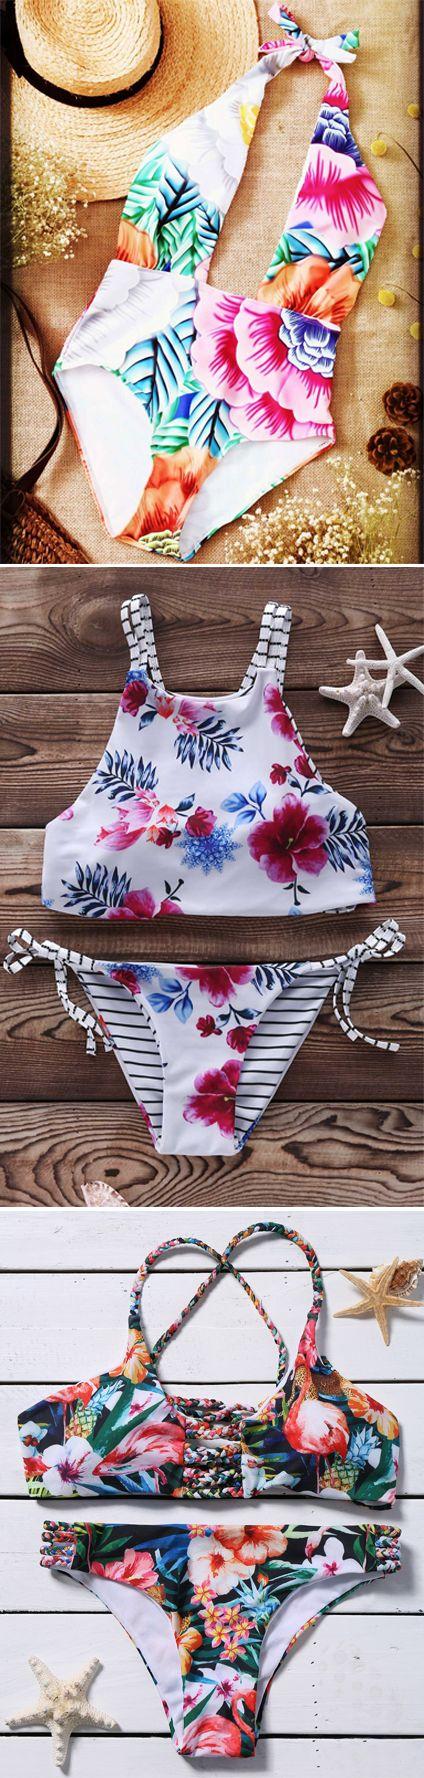 Blossoming Chic: The new season flora print | swimwear,bikini,one pieces,dress,dresses,tops,women fashion | #Floral print